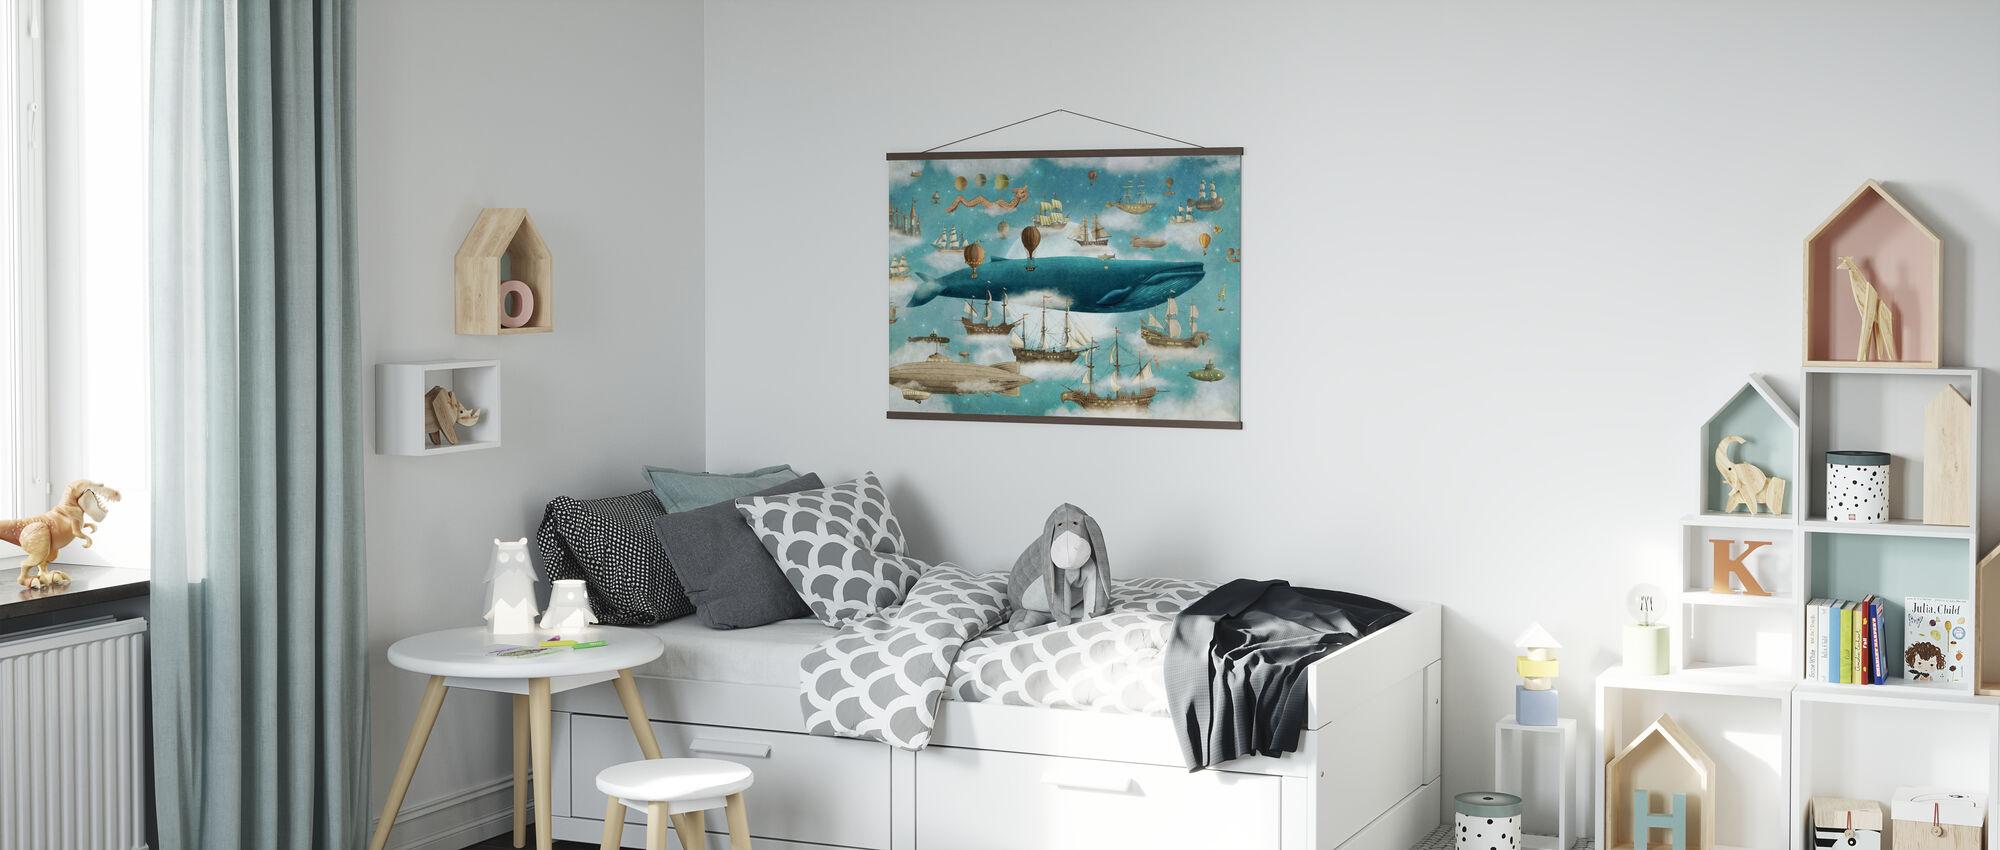 Ocean Meets Sky Cover - Poster - Kids Room